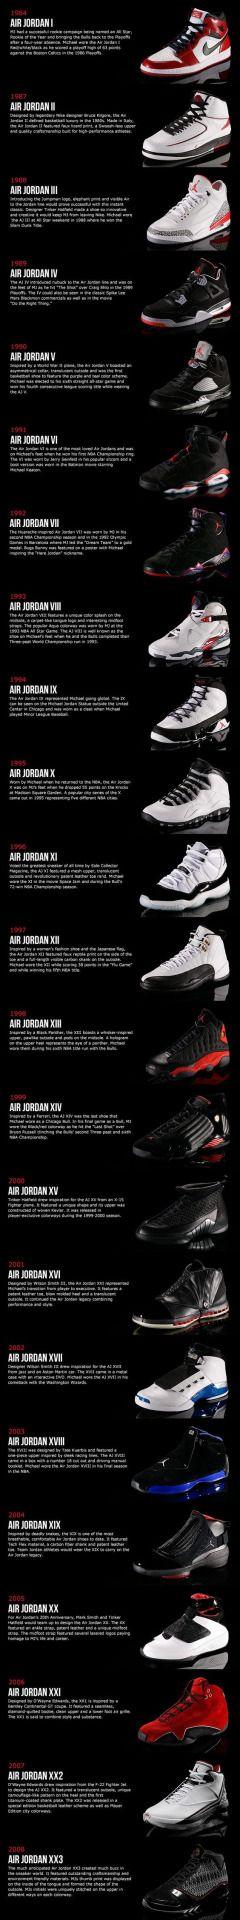 Nike air jordan series all at http://www.dkbilligenikefree.com/air-jordan-c-1_17/